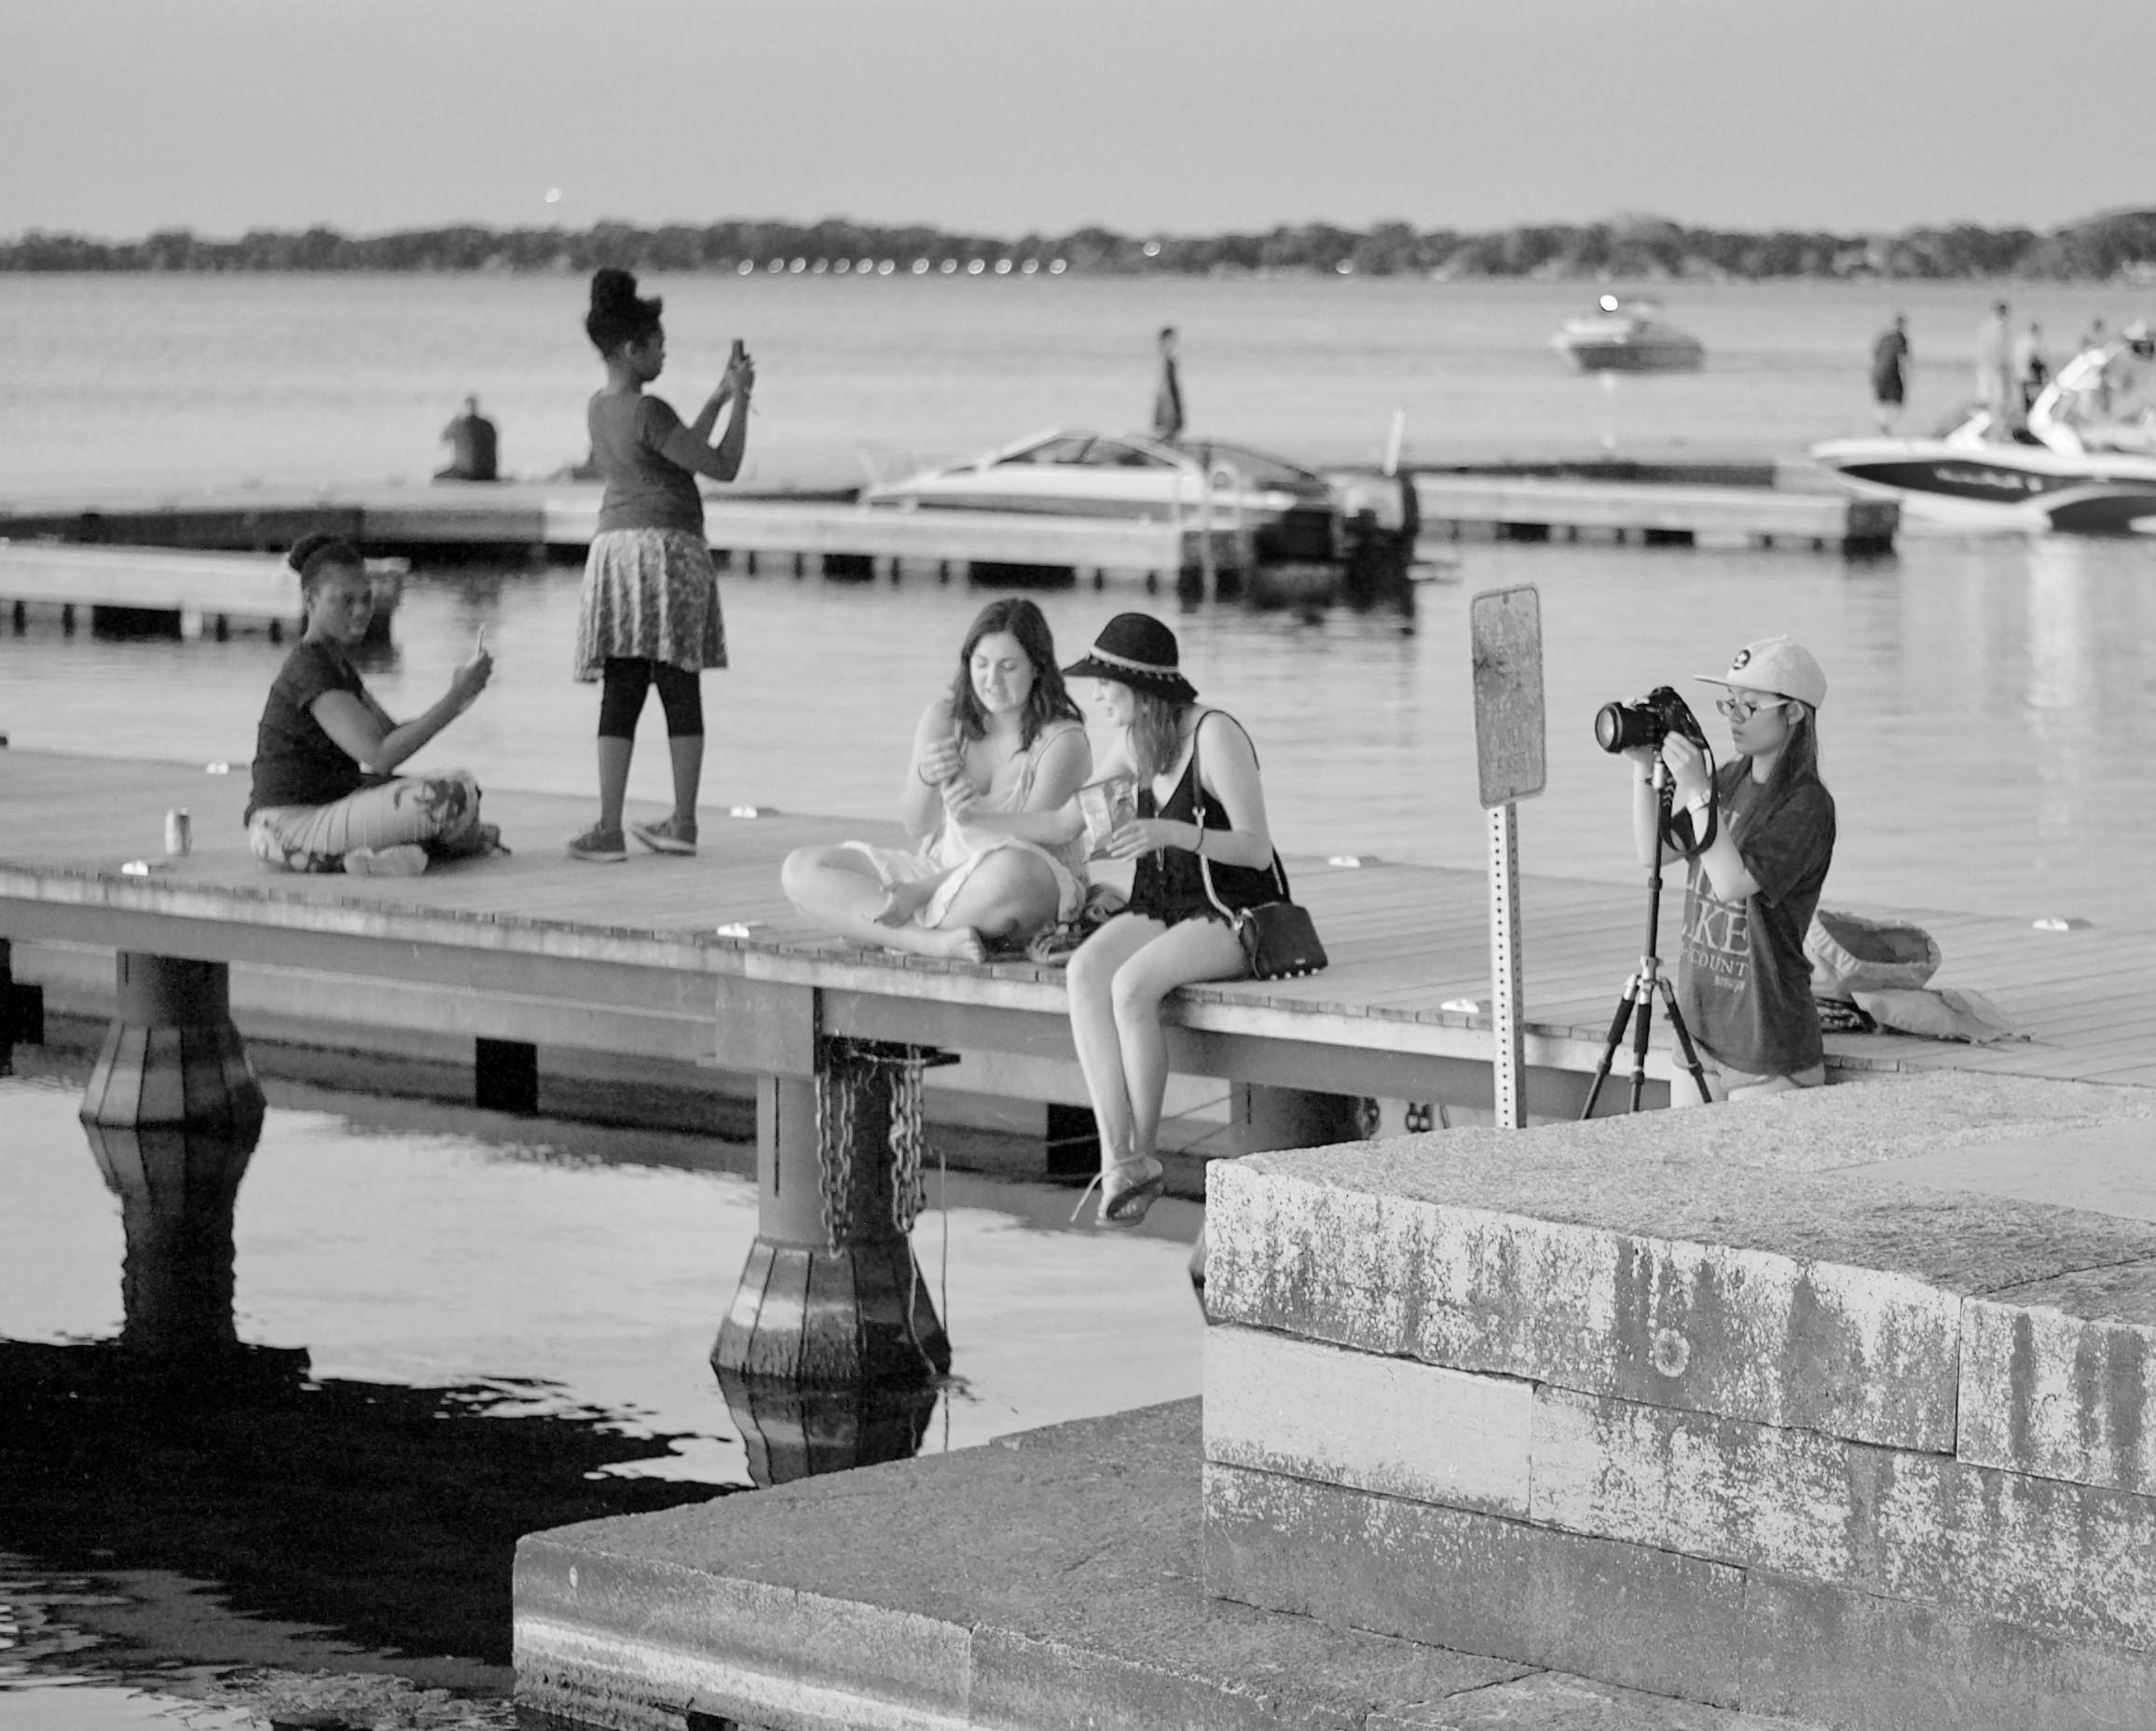 Five Photographers. Memorial Union. Madison, Wisconsin. June 2017. © William D. Walker